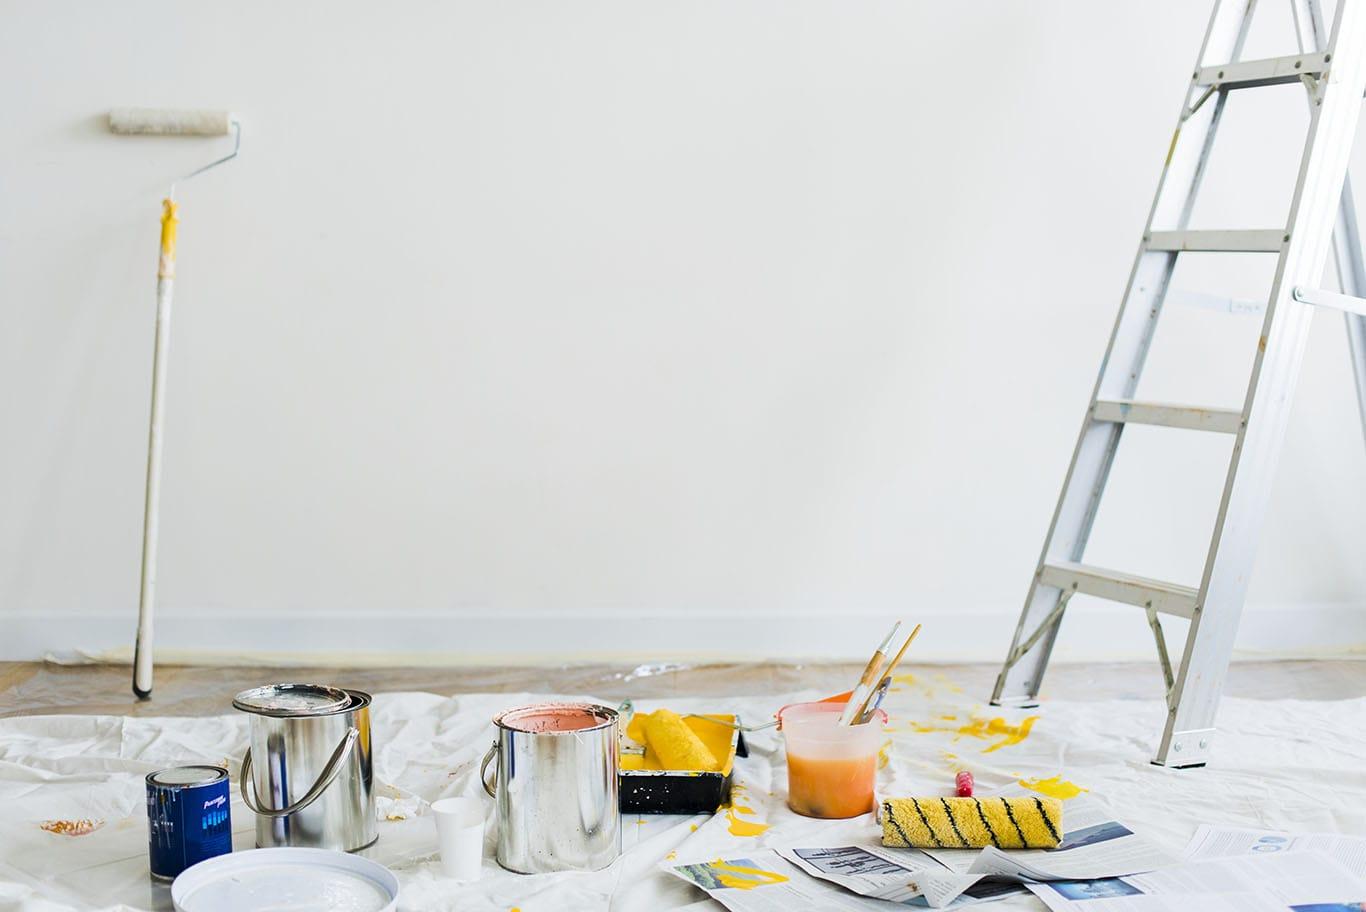 https://fbrconstruction.com/wp-content/uploads/2020/10/buckets-of-paint-on-the-floor-min.jpg